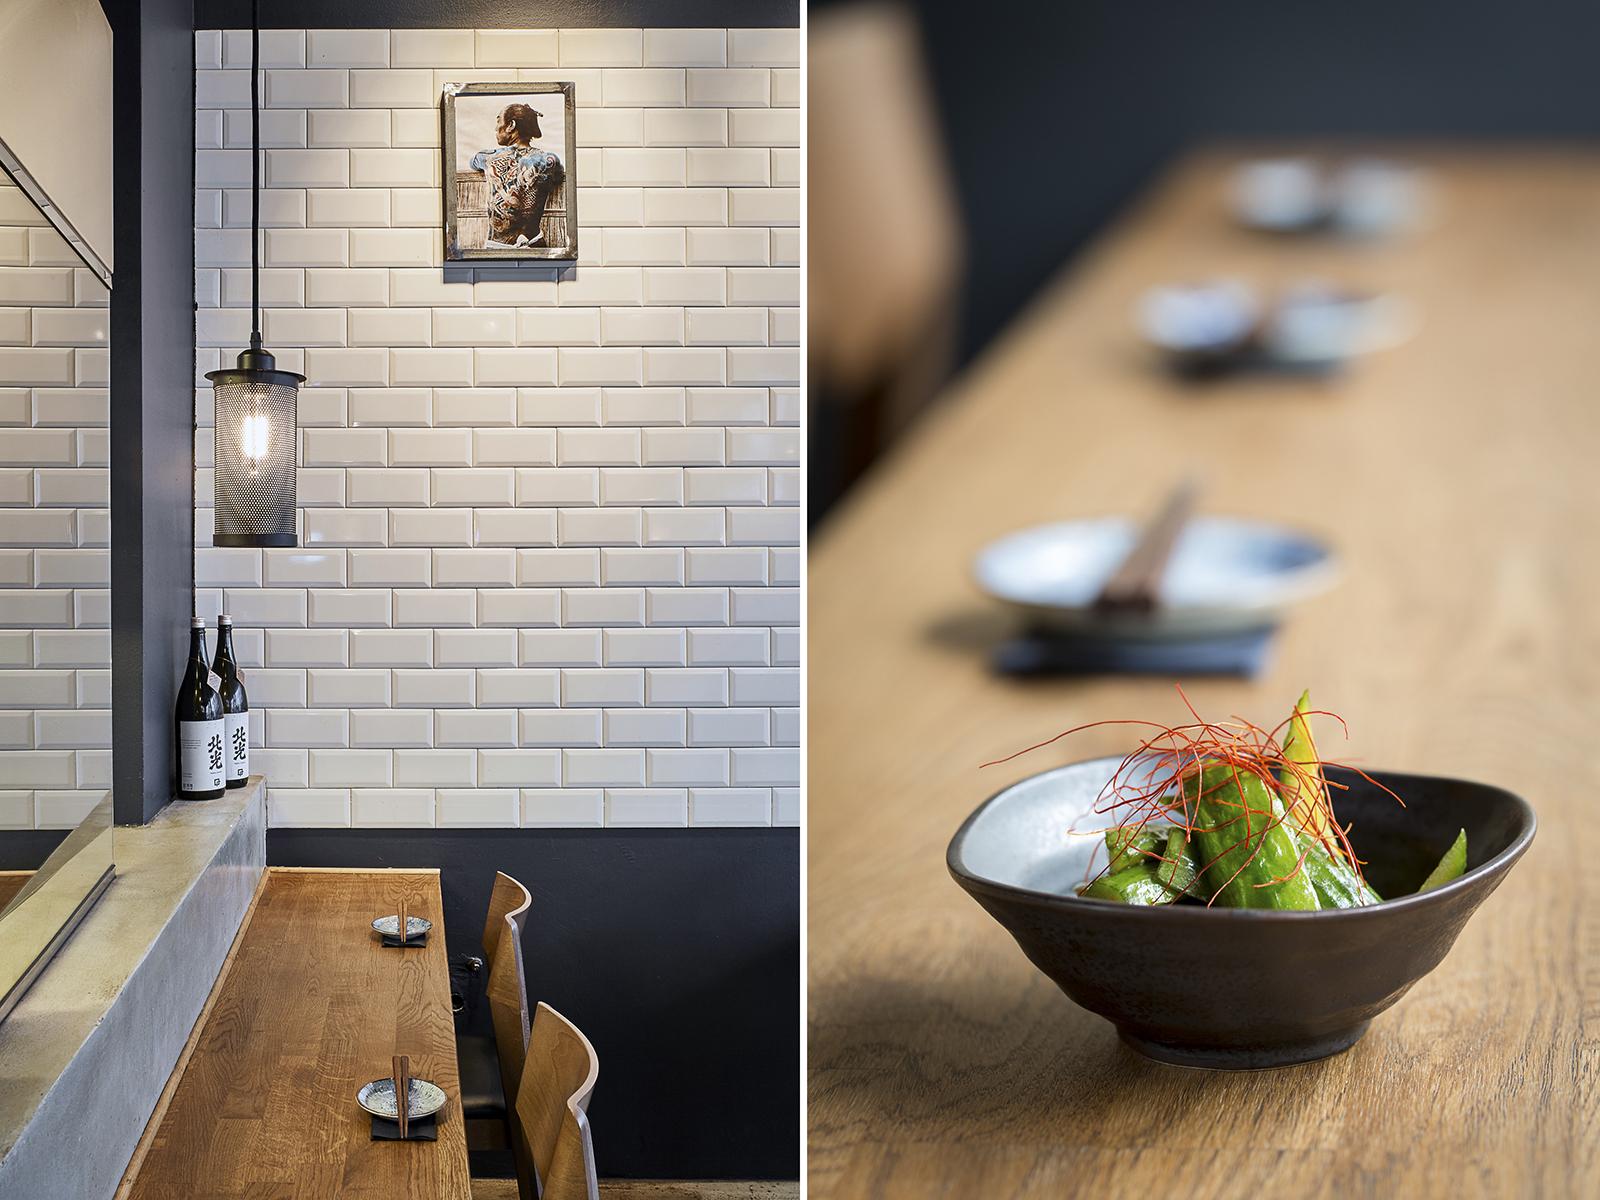 restaurantfotografie bei daikan annika feuss. Black Bedroom Furniture Sets. Home Design Ideas